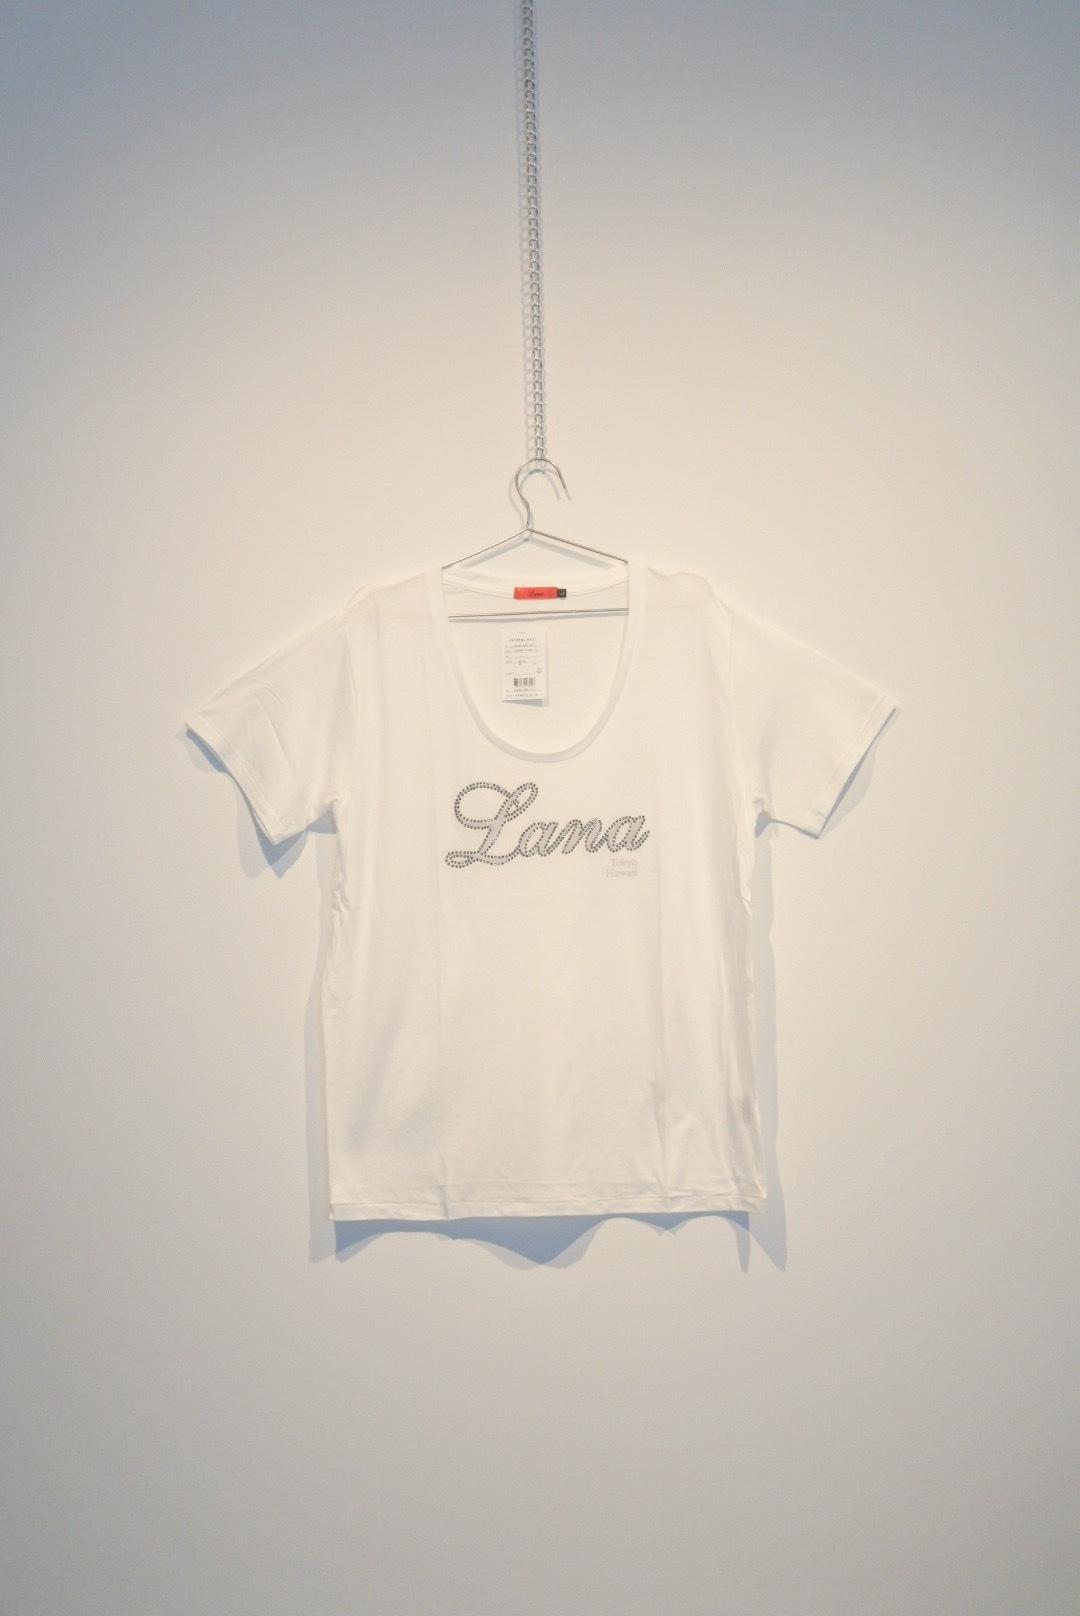 Lana(CRYSTAL BALL) ラインストーンLana UネックTシャツ白 jwtvt0037